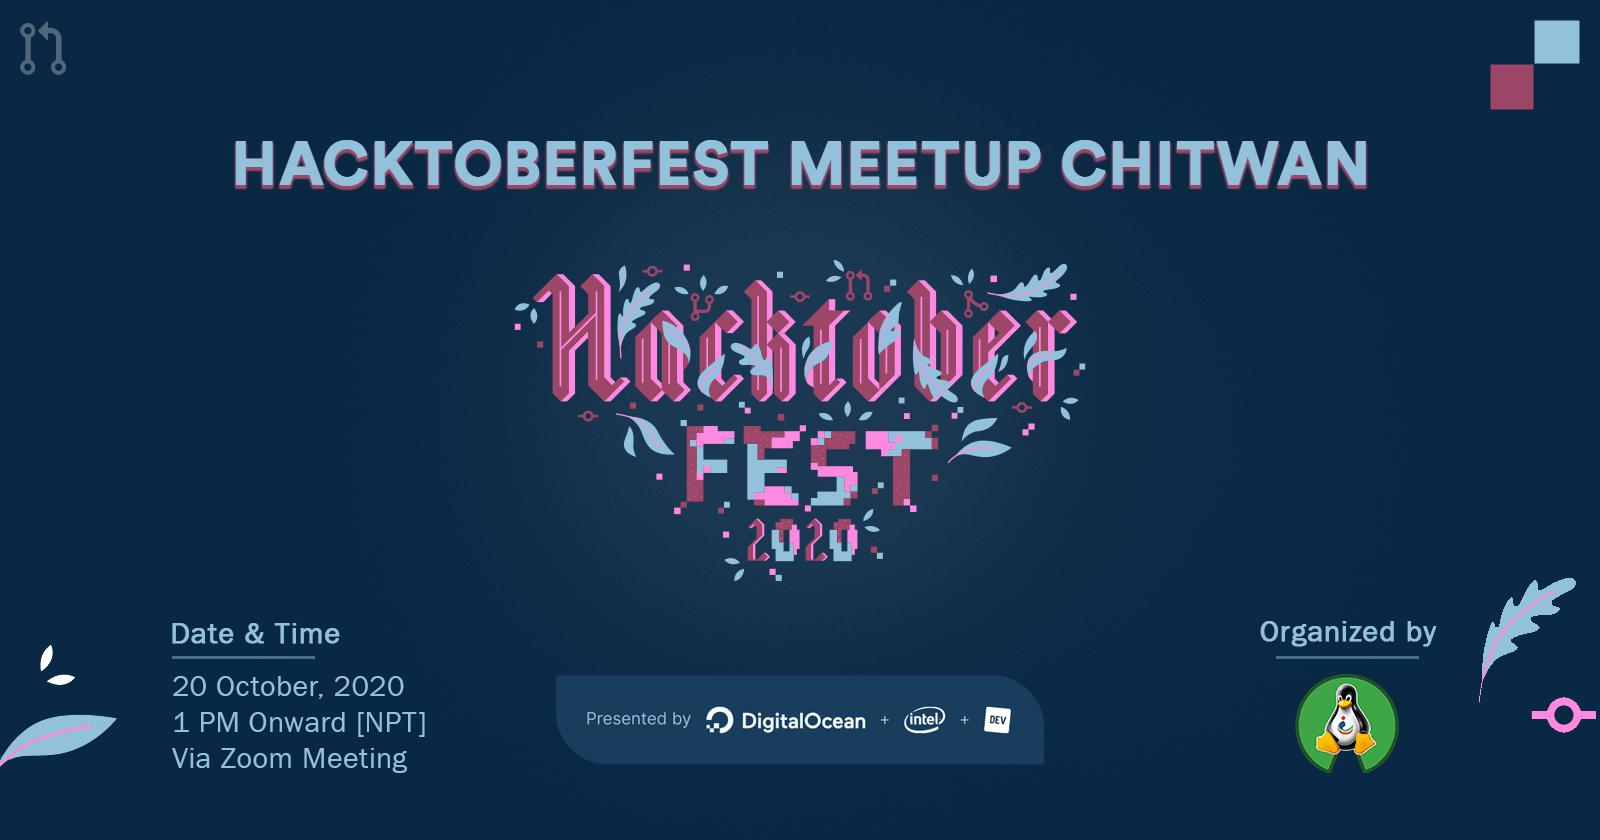 hacktoberfest meetup chitwan